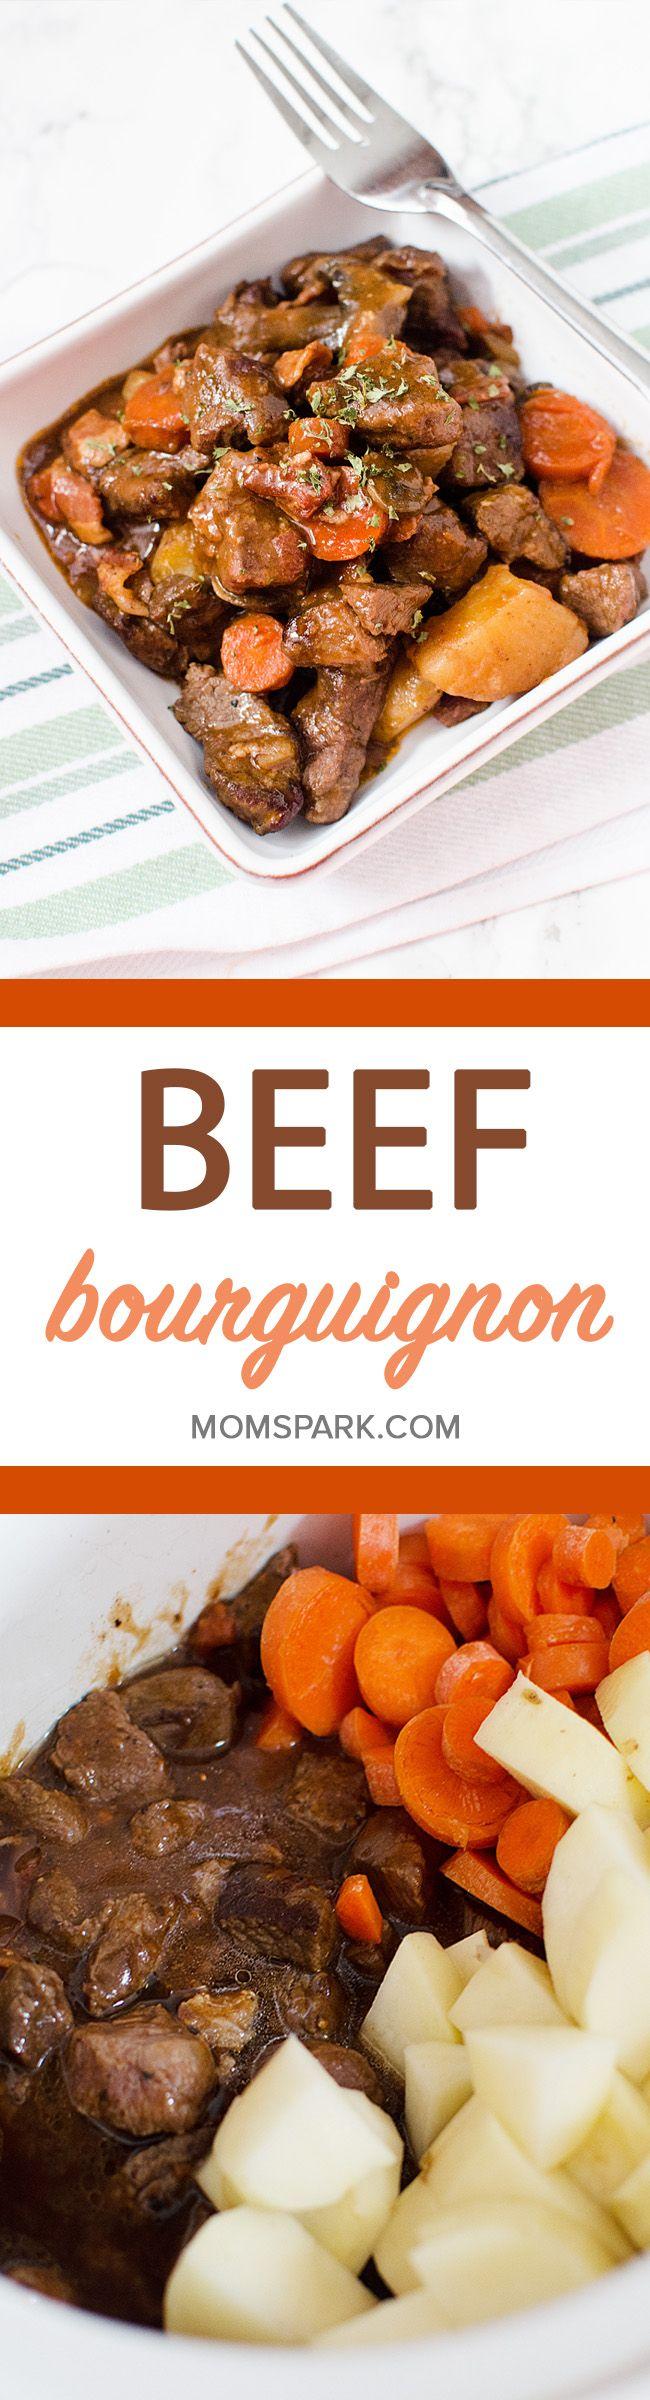 Easy Slow Cooker Beef Bourguignon Recipe